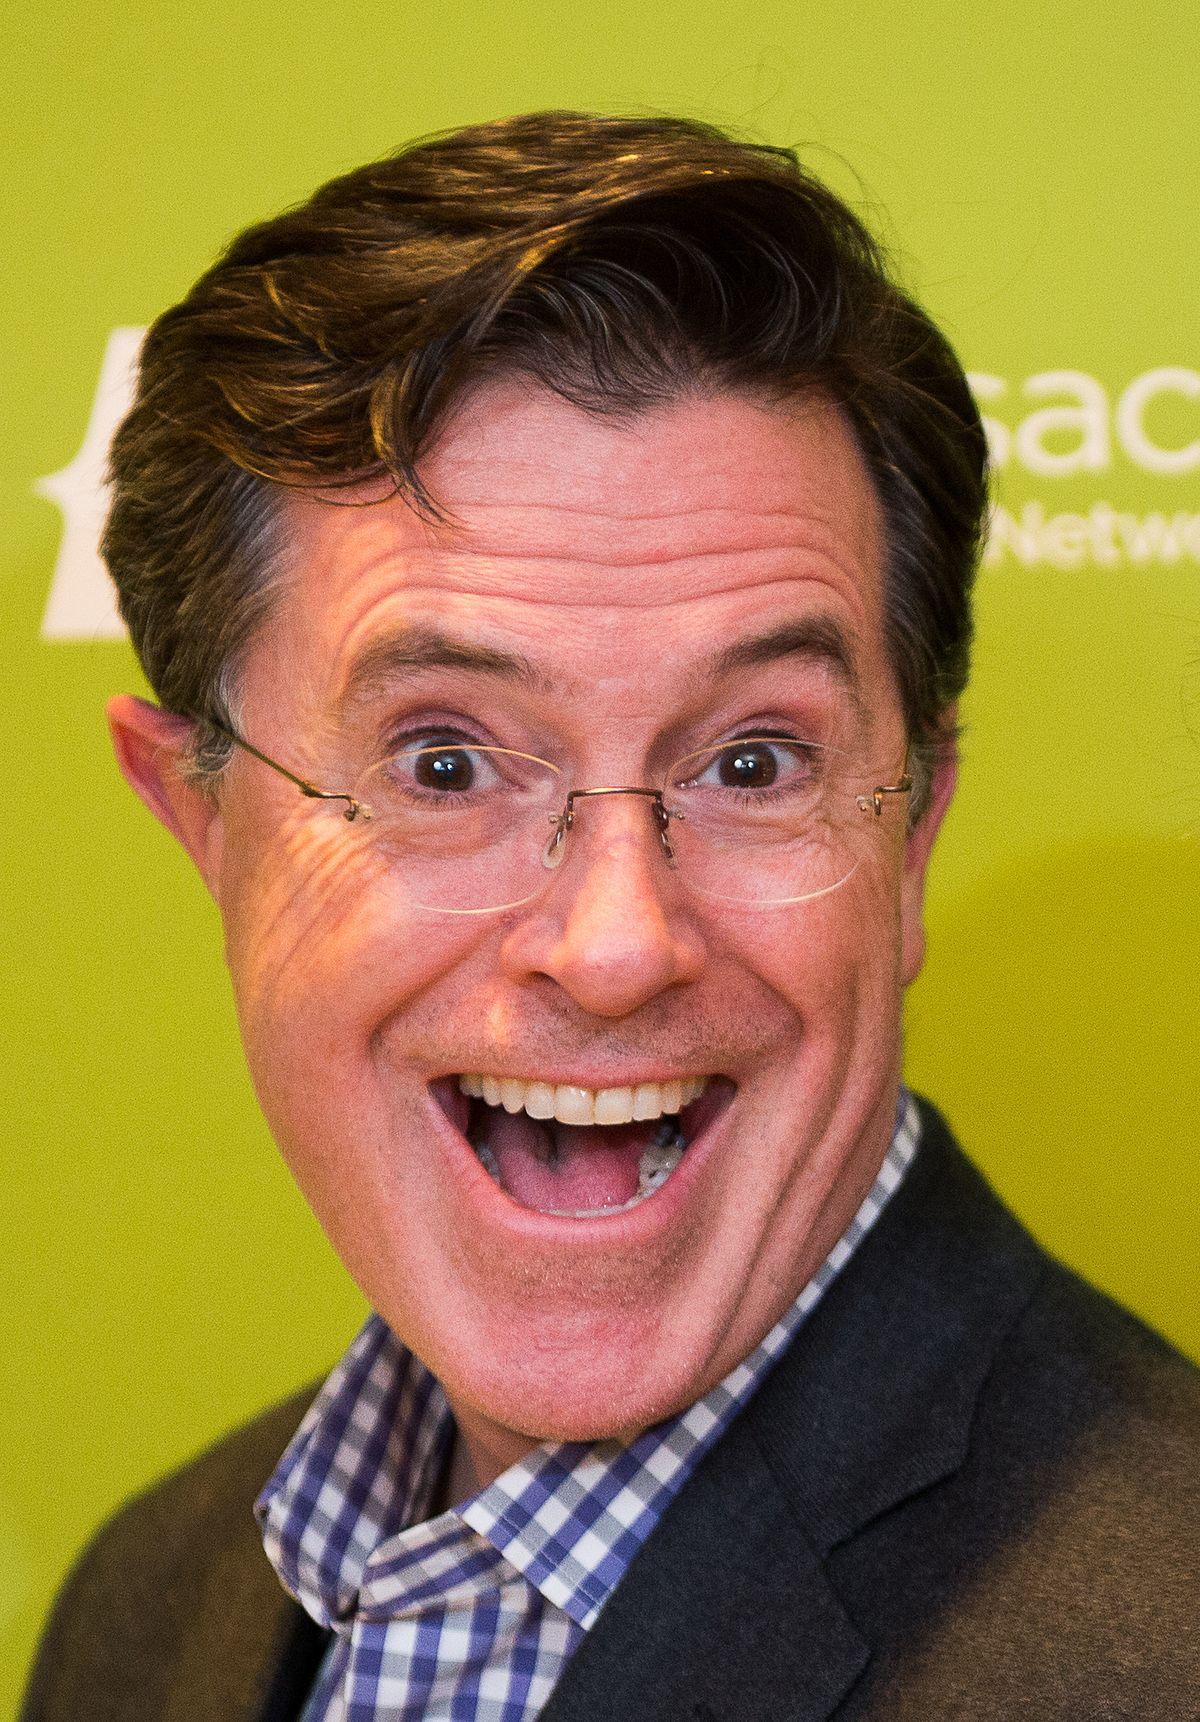 Stephen Colbert S Dog Image